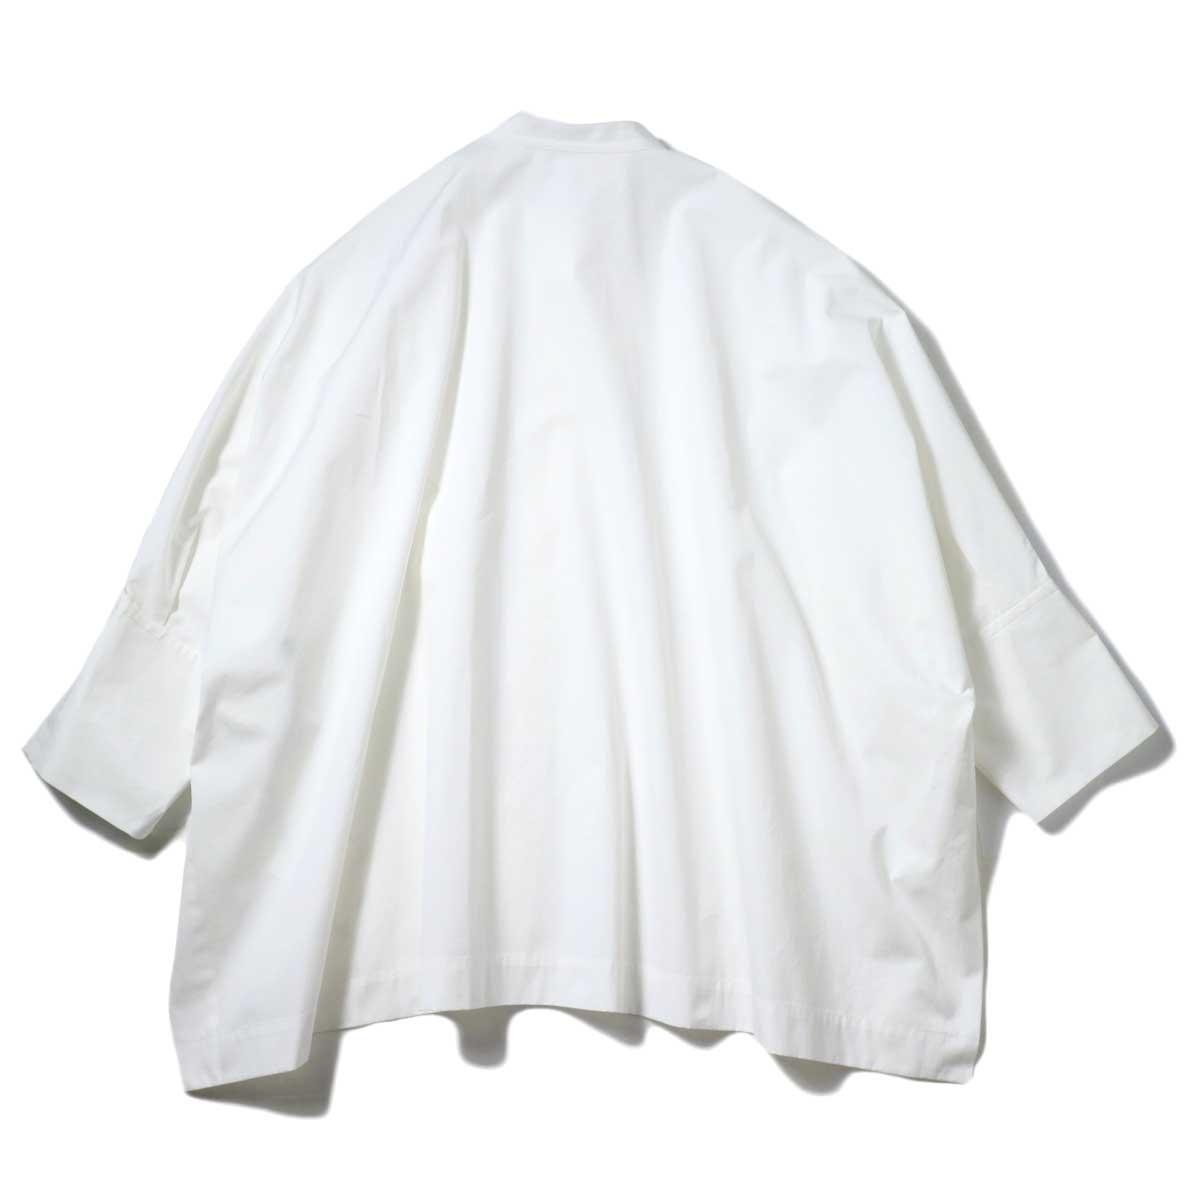 YLEVE / COTTON TYPEW RITER BIG SHIRT (White) 背面